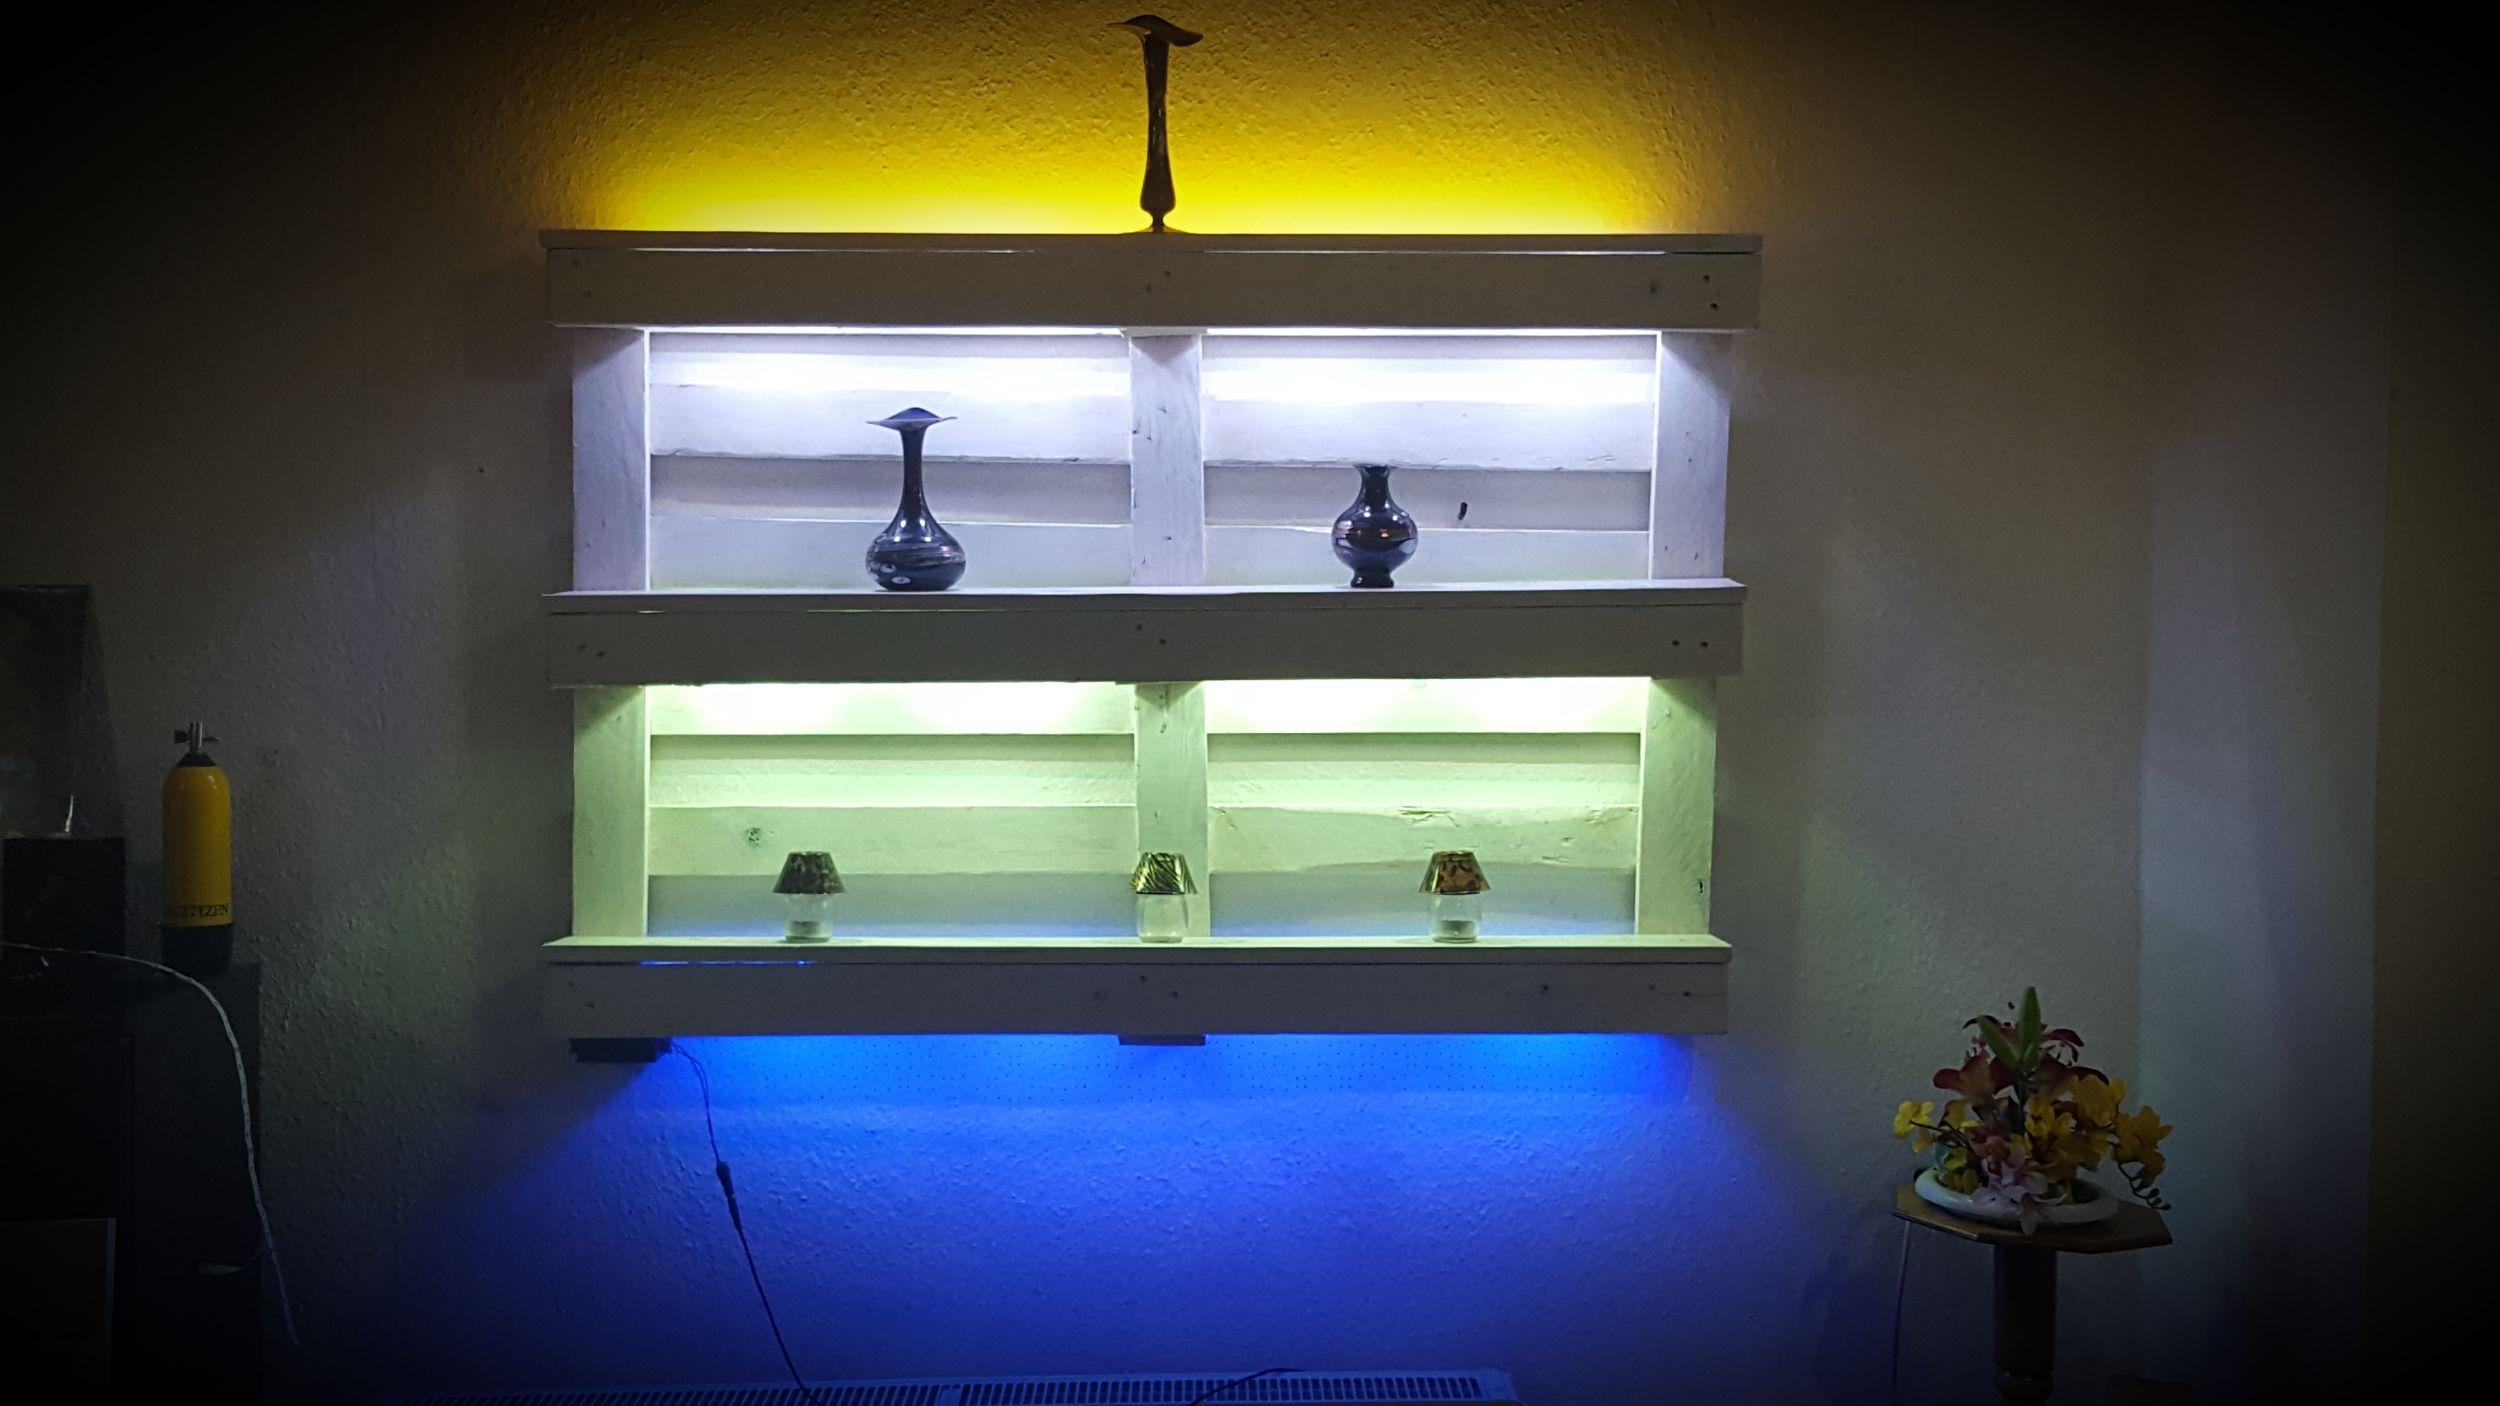 Paletten Regal Mit Led Beleuchtung Led Beleuchtung Regal Aus Paletten Beleuchtung